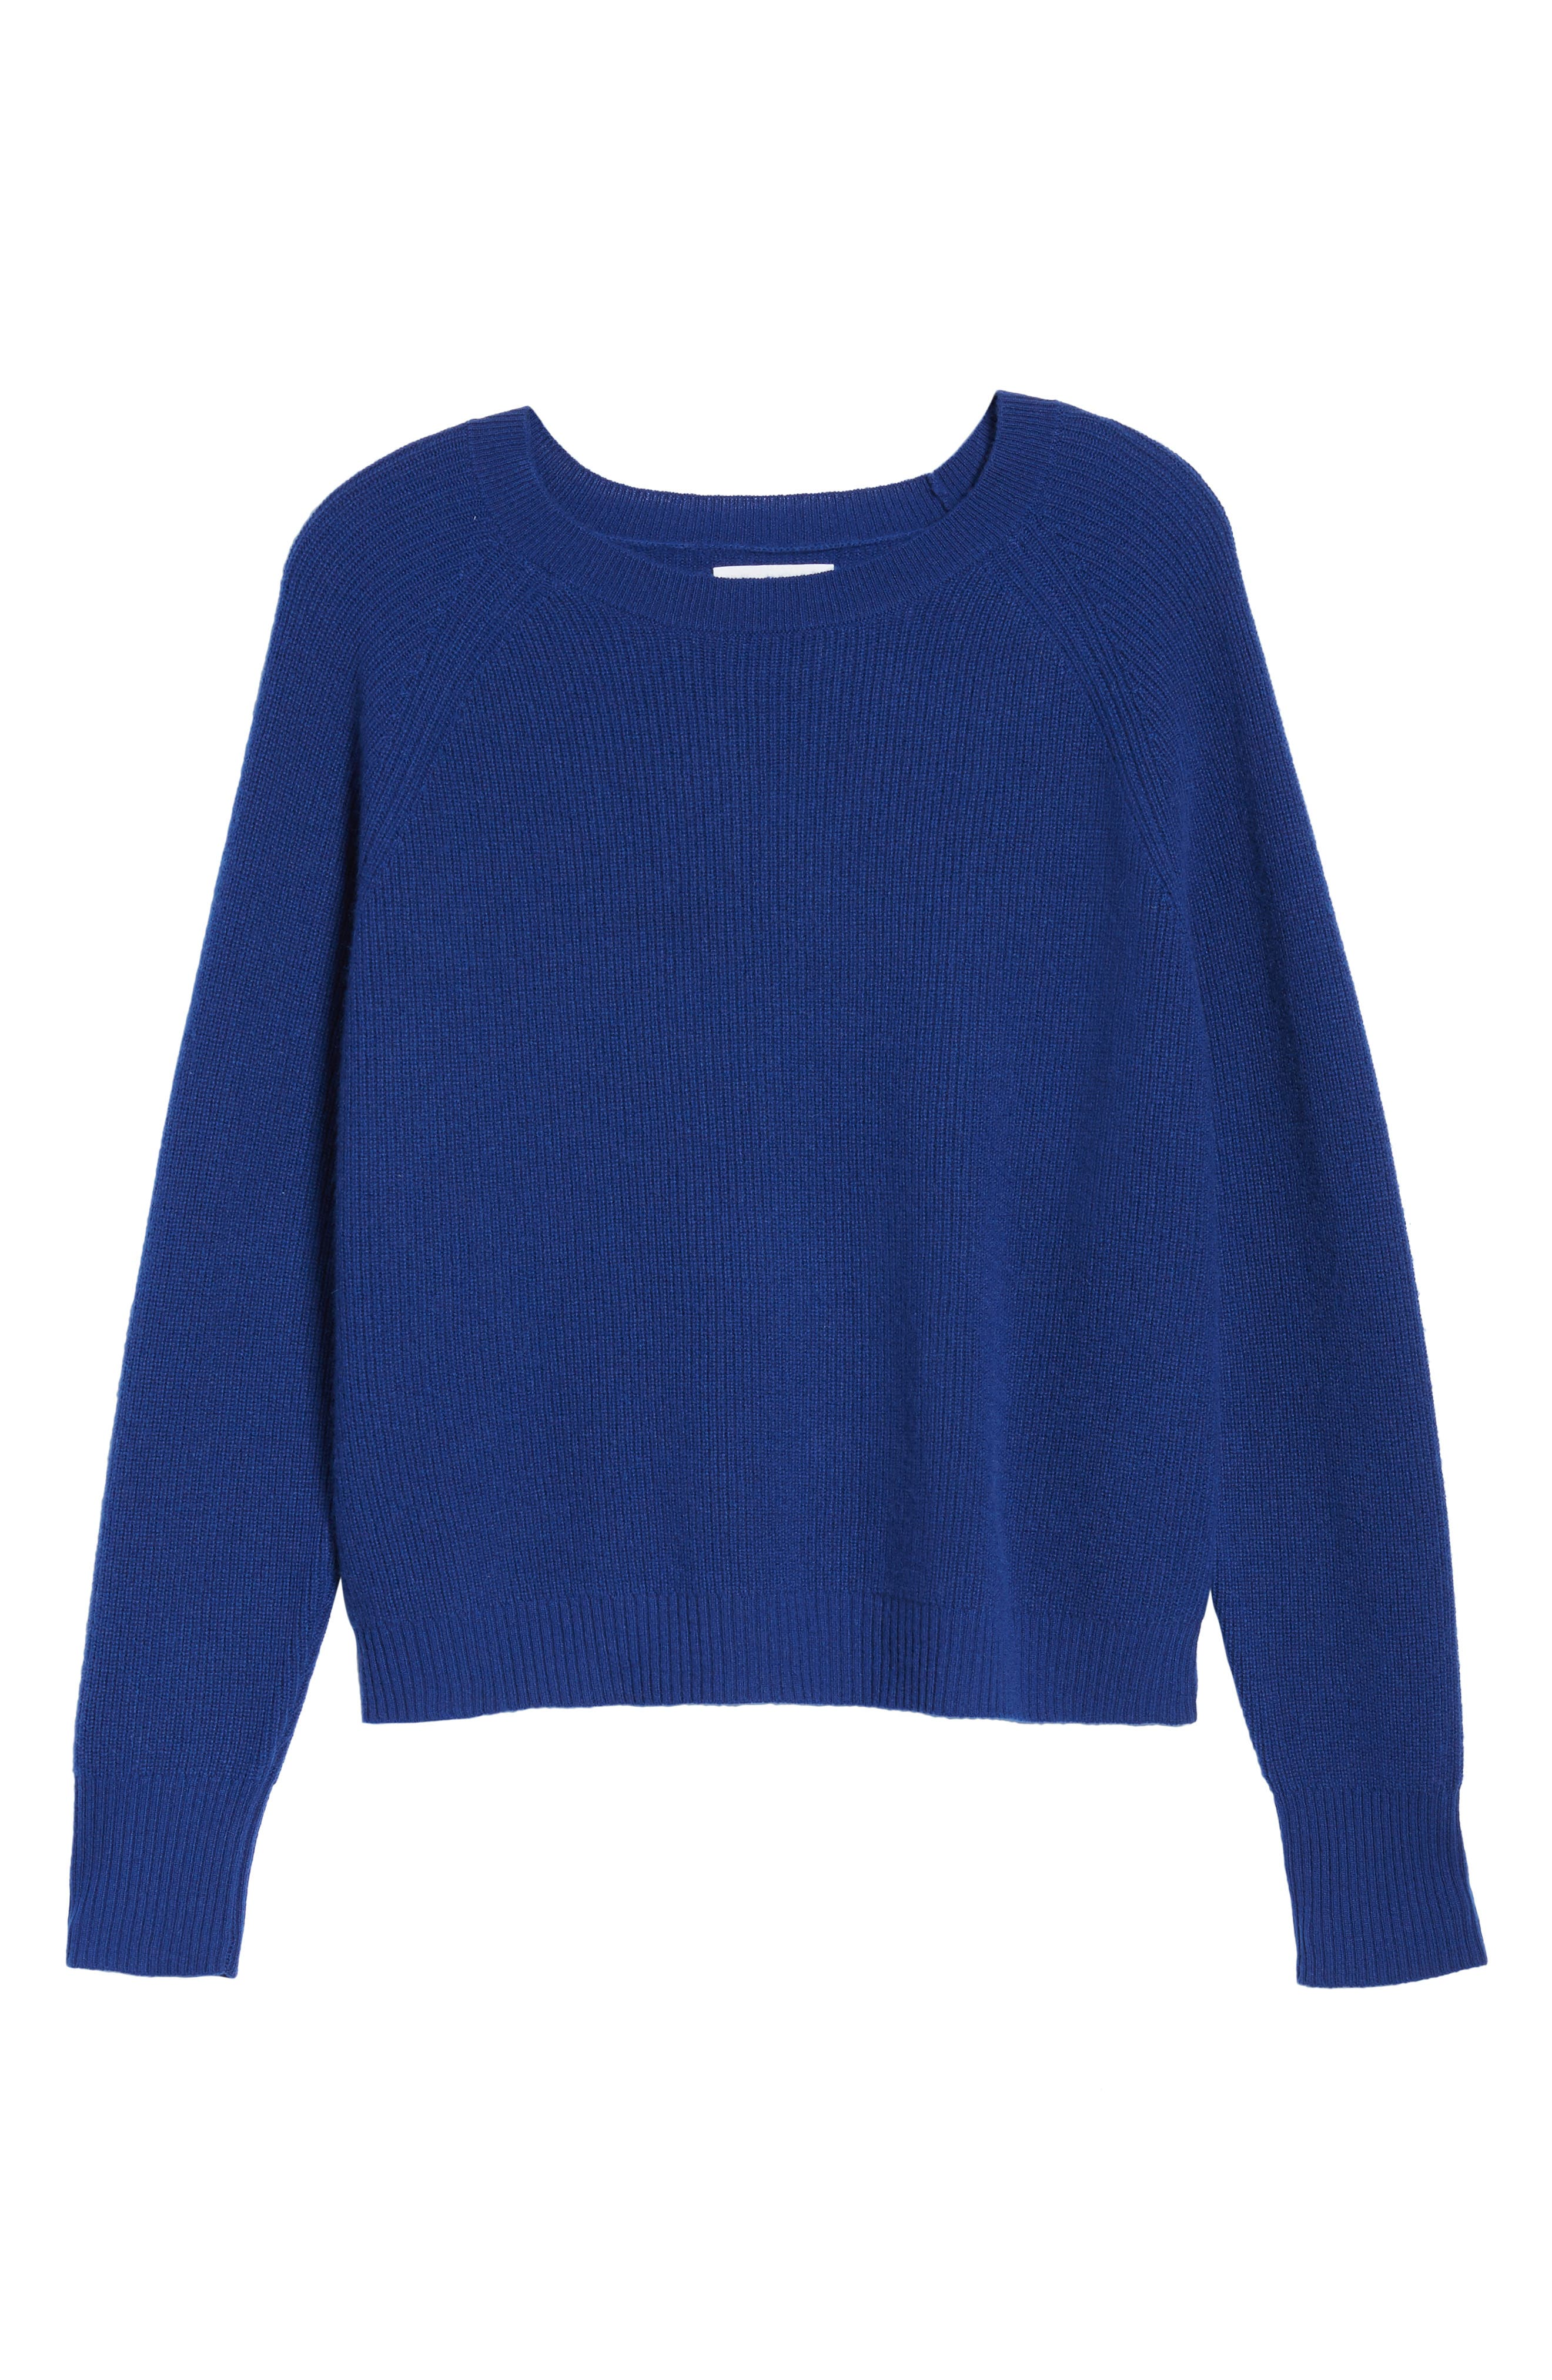 Cashmere Sweater,                             Alternate thumbnail 6, color,                             474